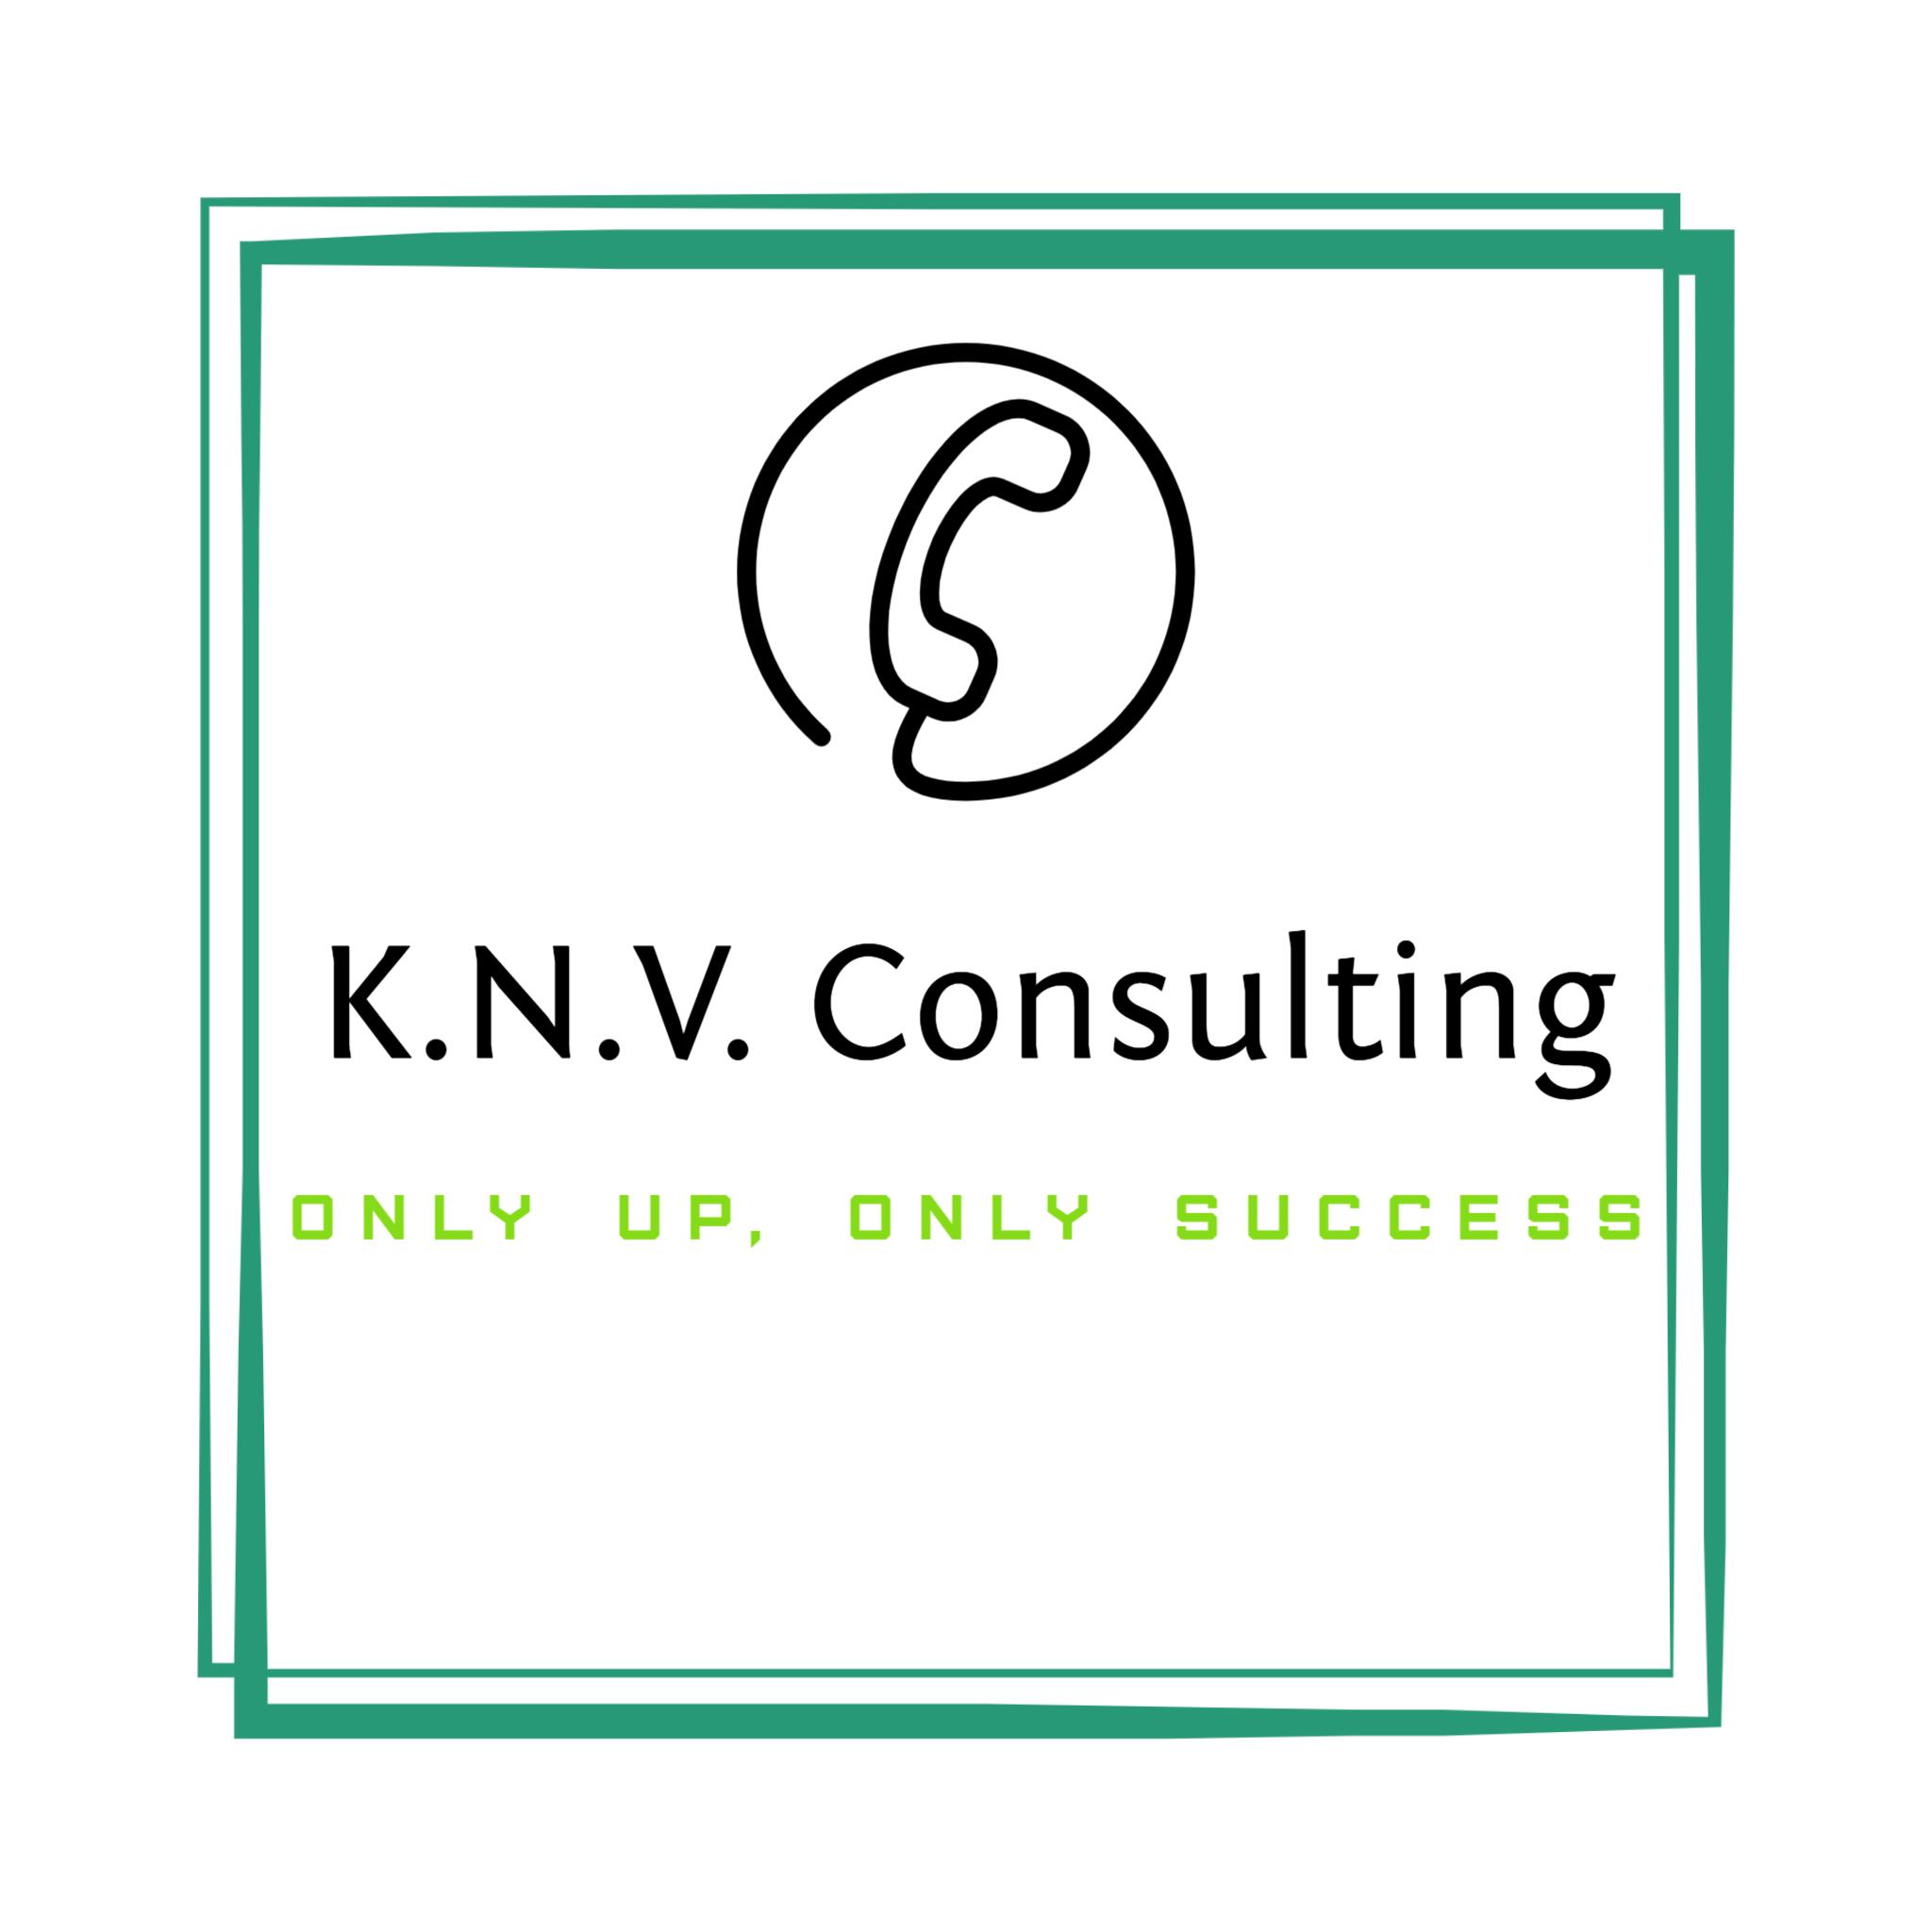 K.N.V. Consulting